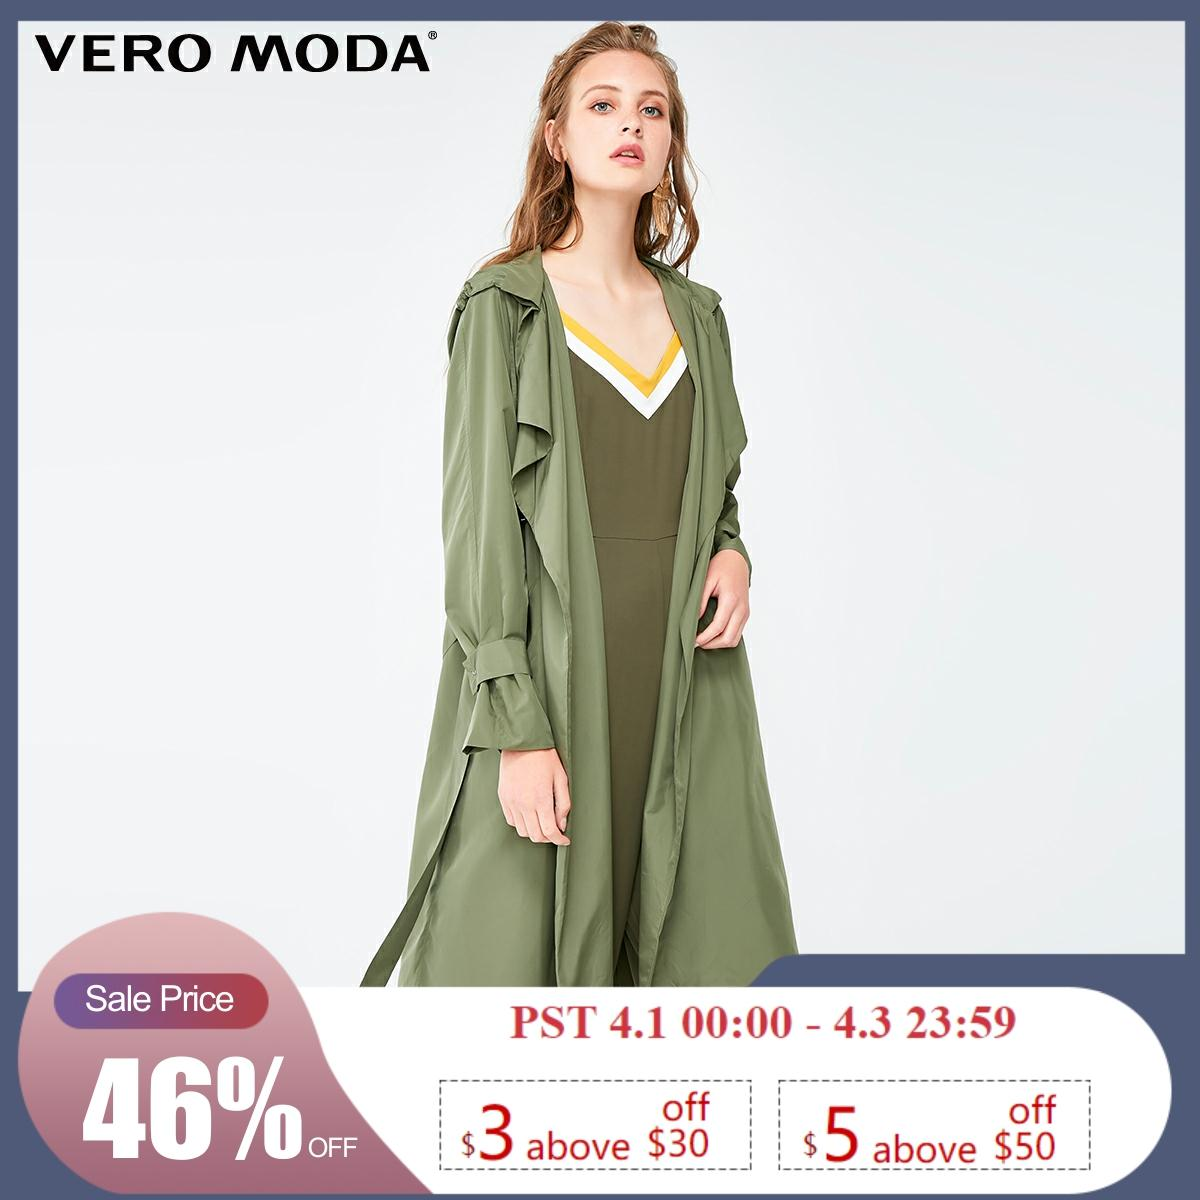 Vero Moda Women's Lapel Lace-up Medium Length Hooded Pure Trench Coat | 318321504